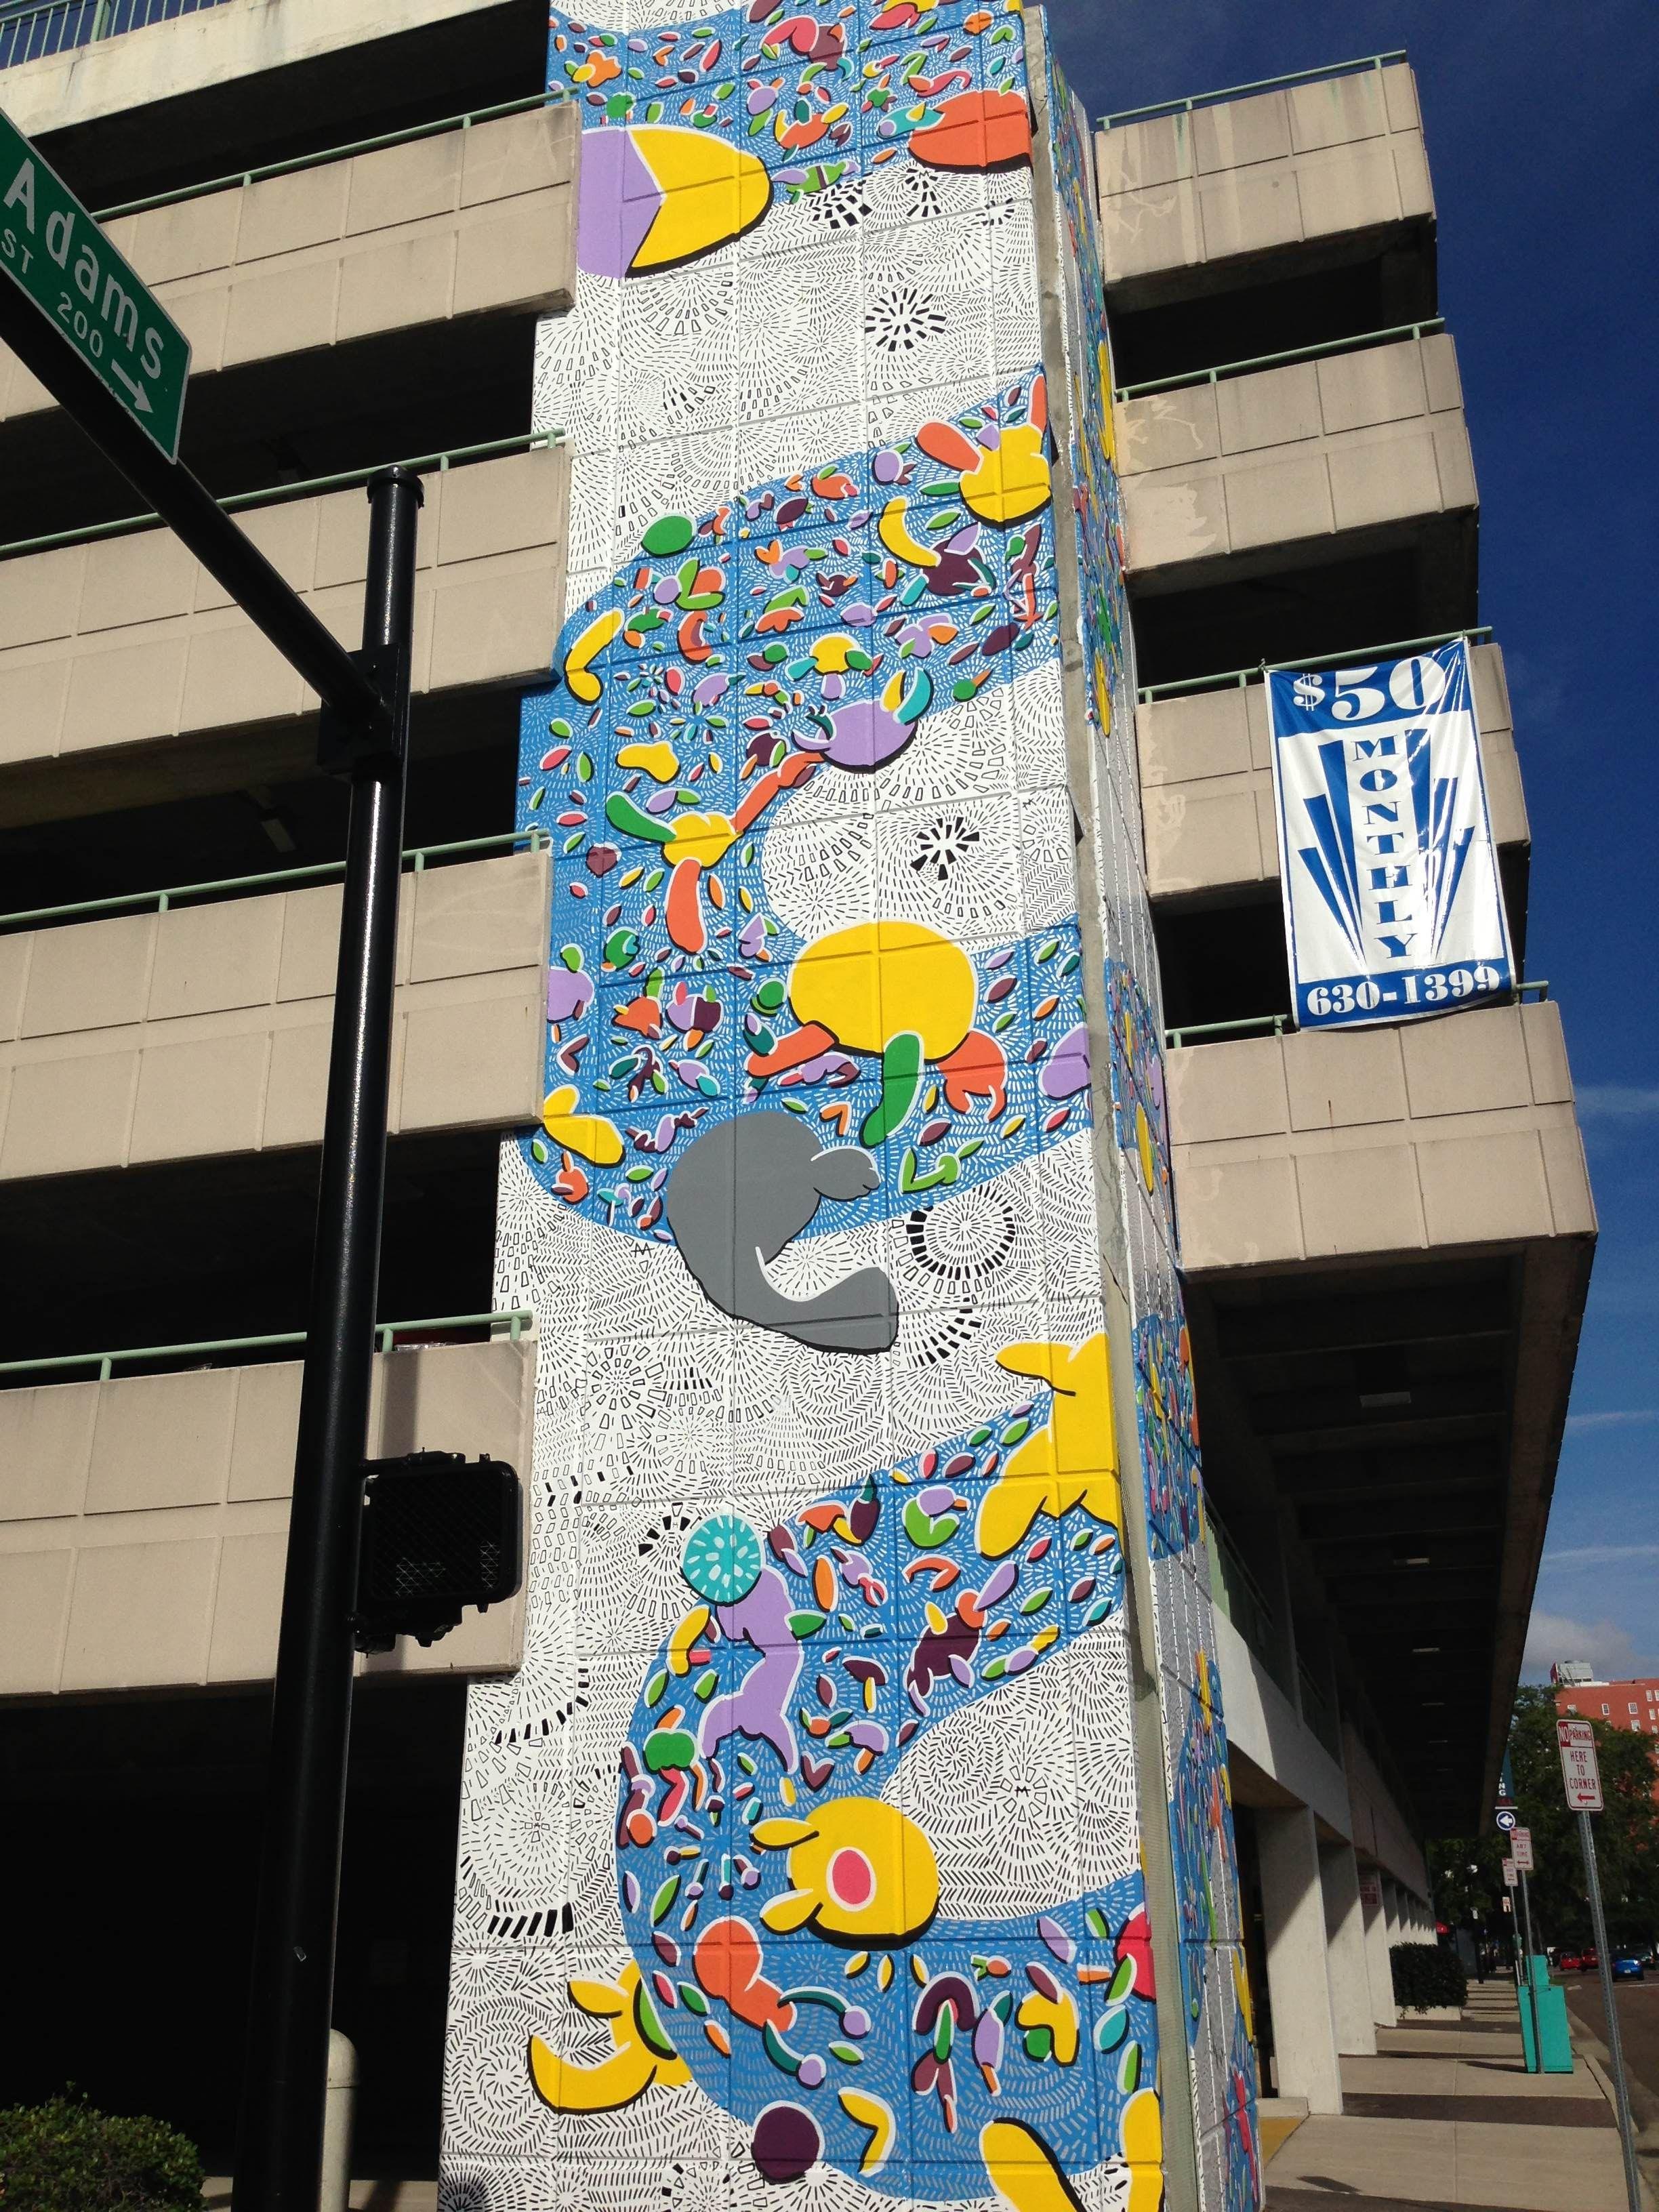 Public mural yates garage downtown jacksonville architecture